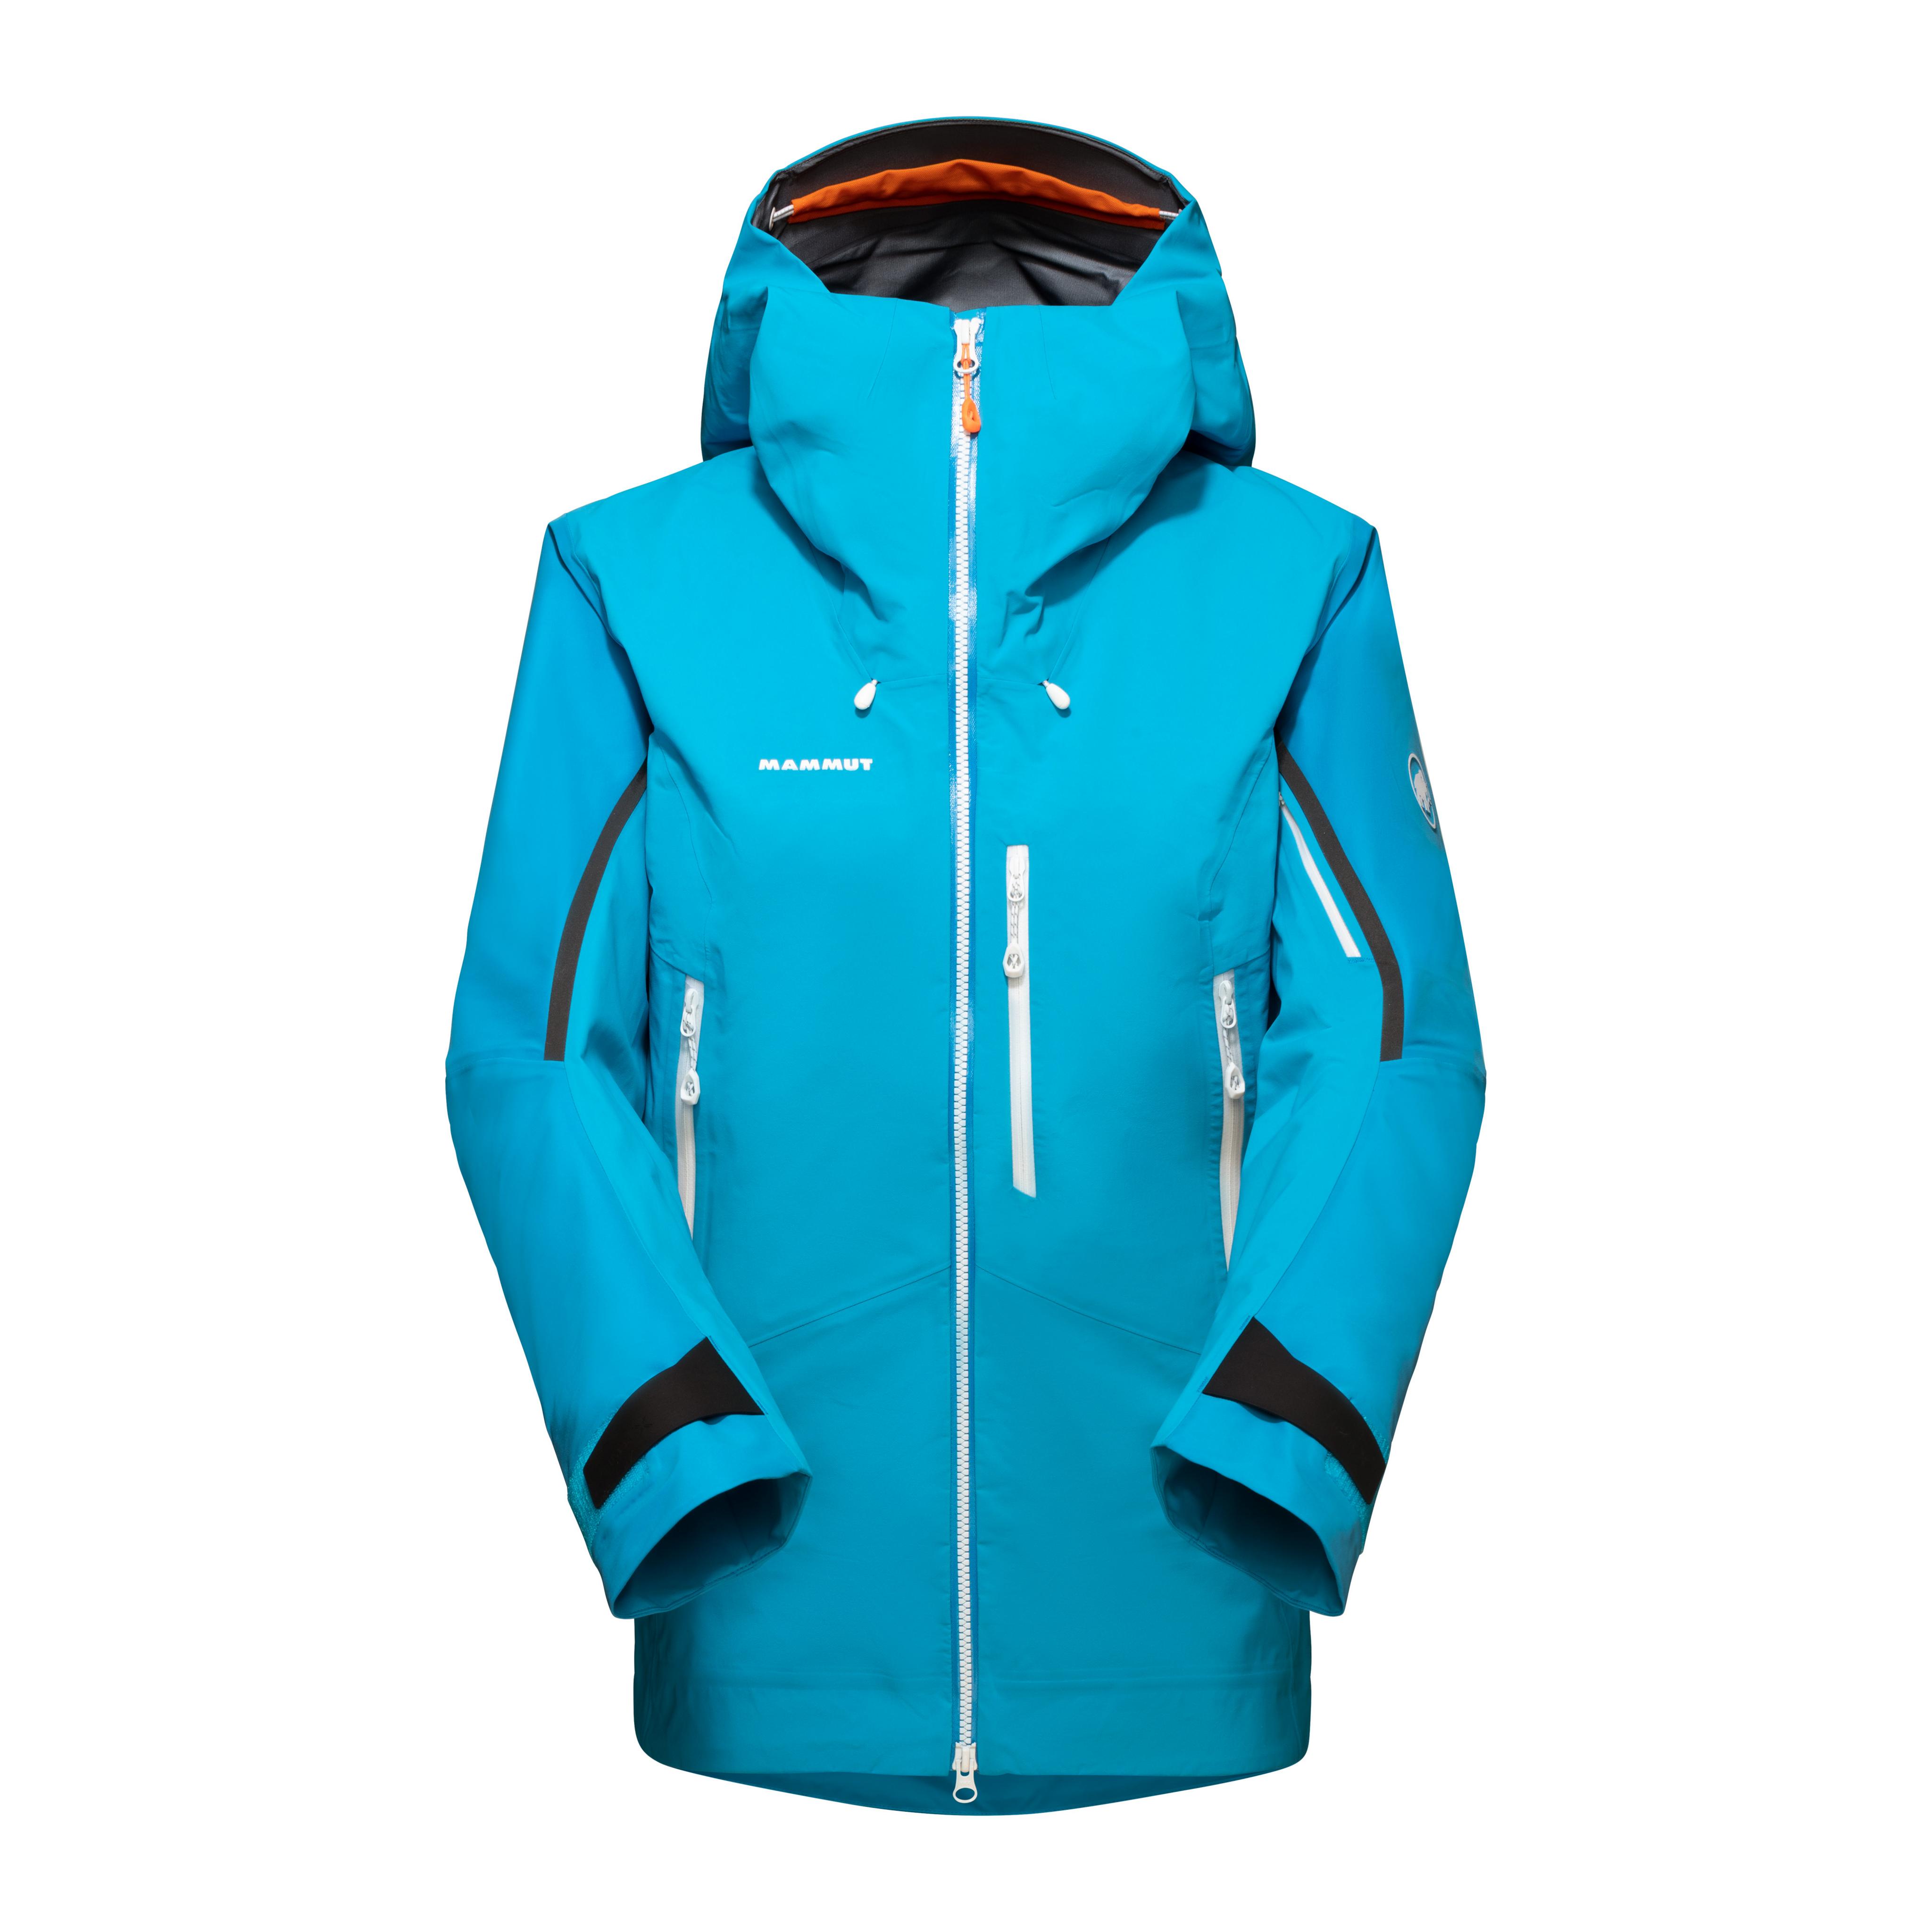 Nordwand Pro HS Hooded Jacket Women - sky, XS thumbnail